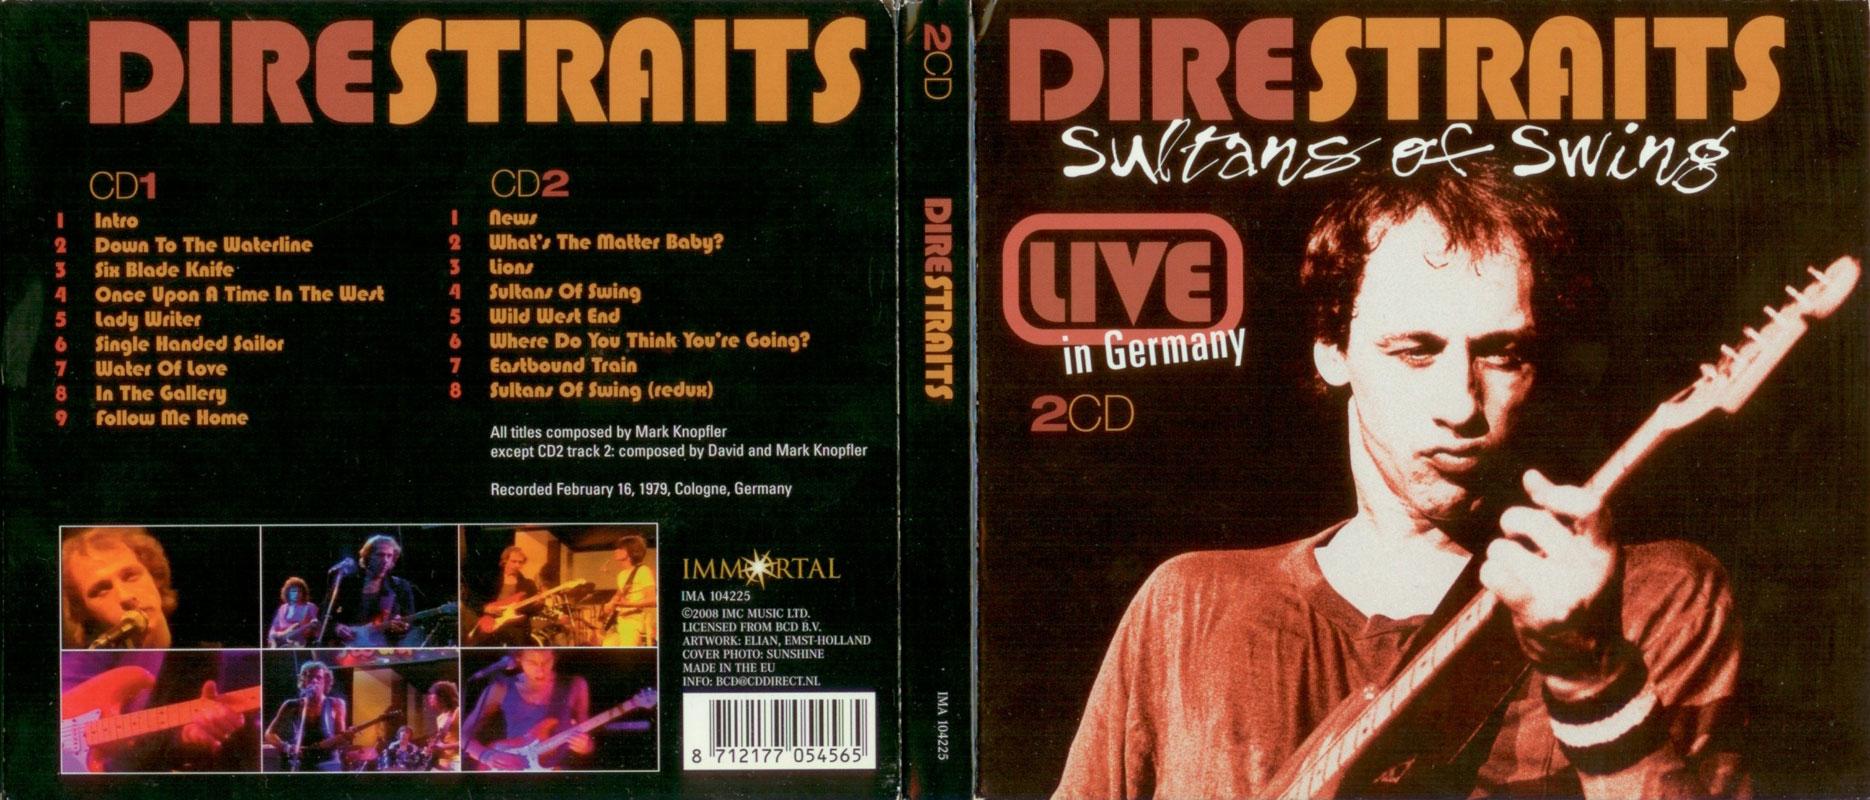 Dire straits sultans of swing download album